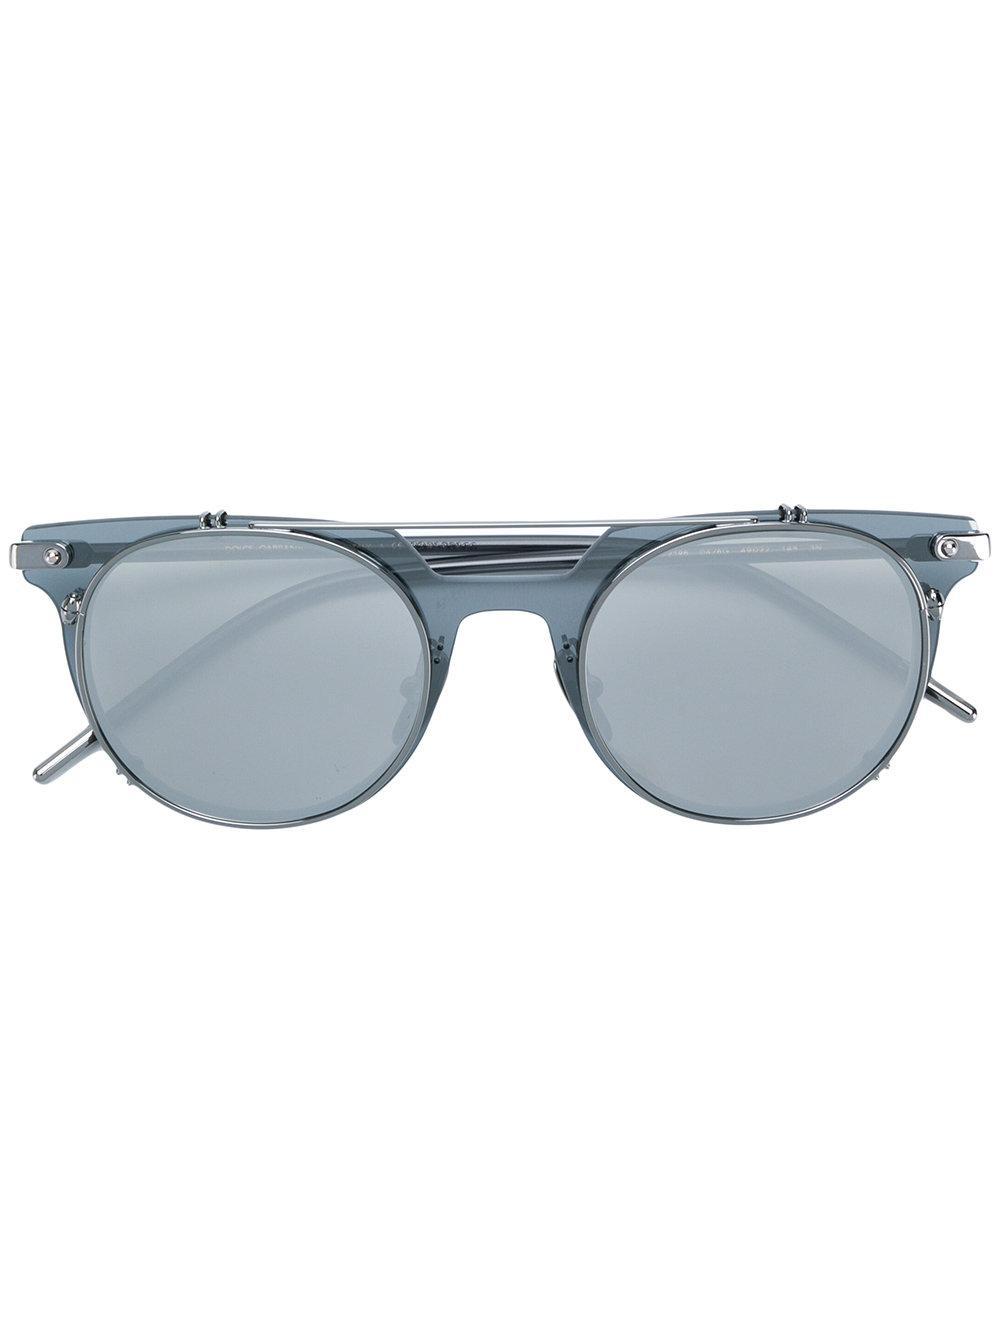 Dolce & Gabbana Round Frame Sunglasses In Grey